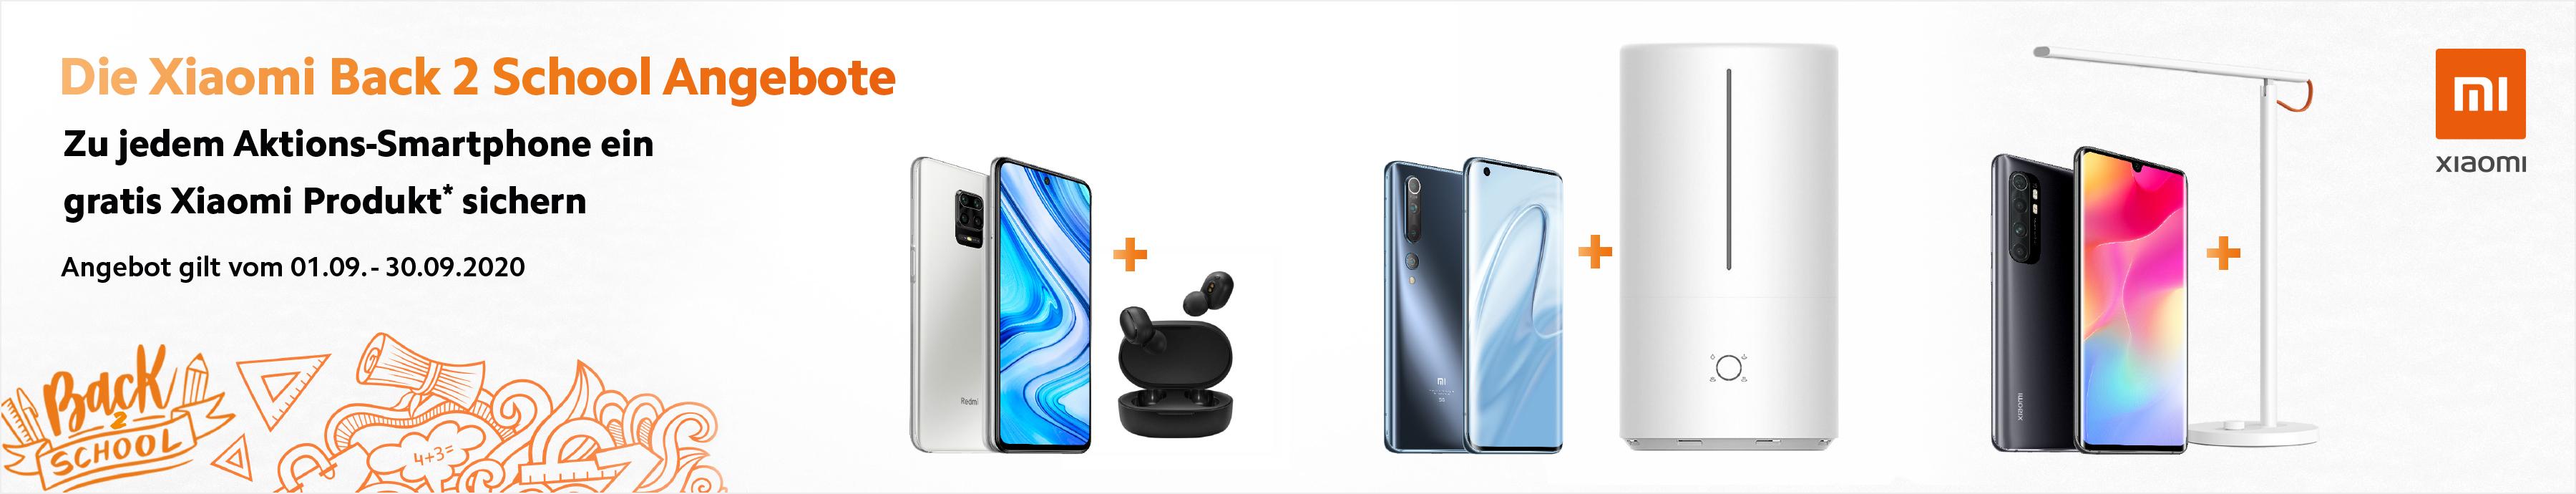 Xiaomi Redmi Note 9 Pro, Xiaomi Mi 10